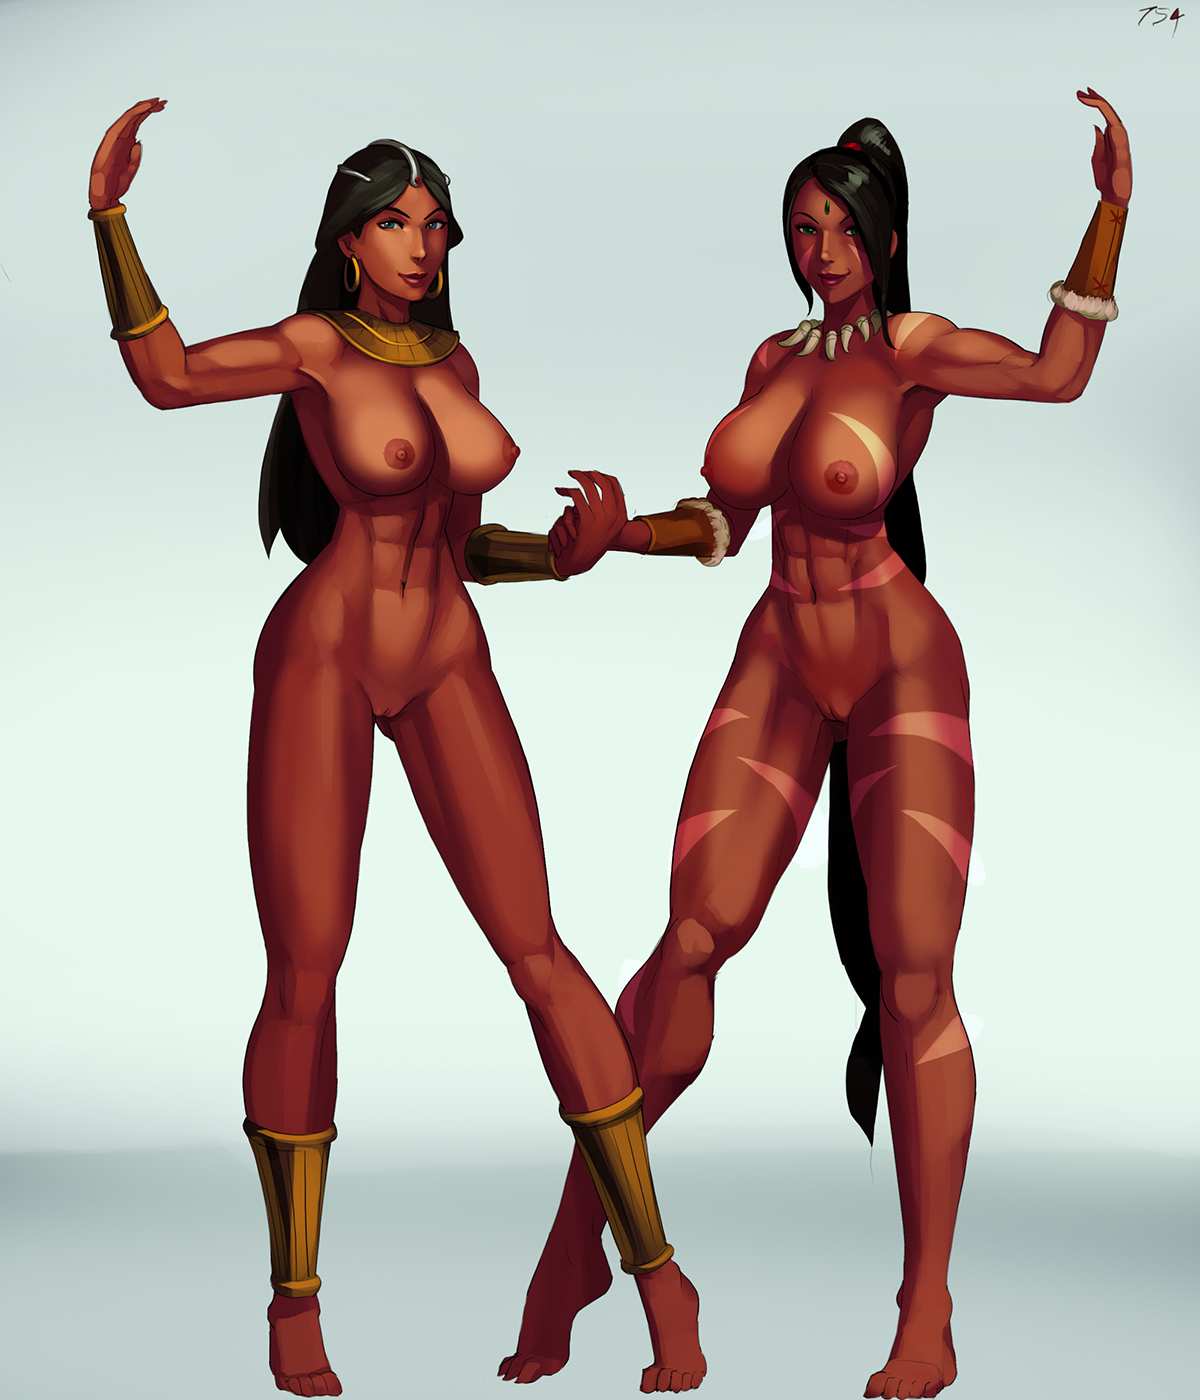 2320945 - Aka6 Diablo League_of_Legends Nidalee Sorceress crossover